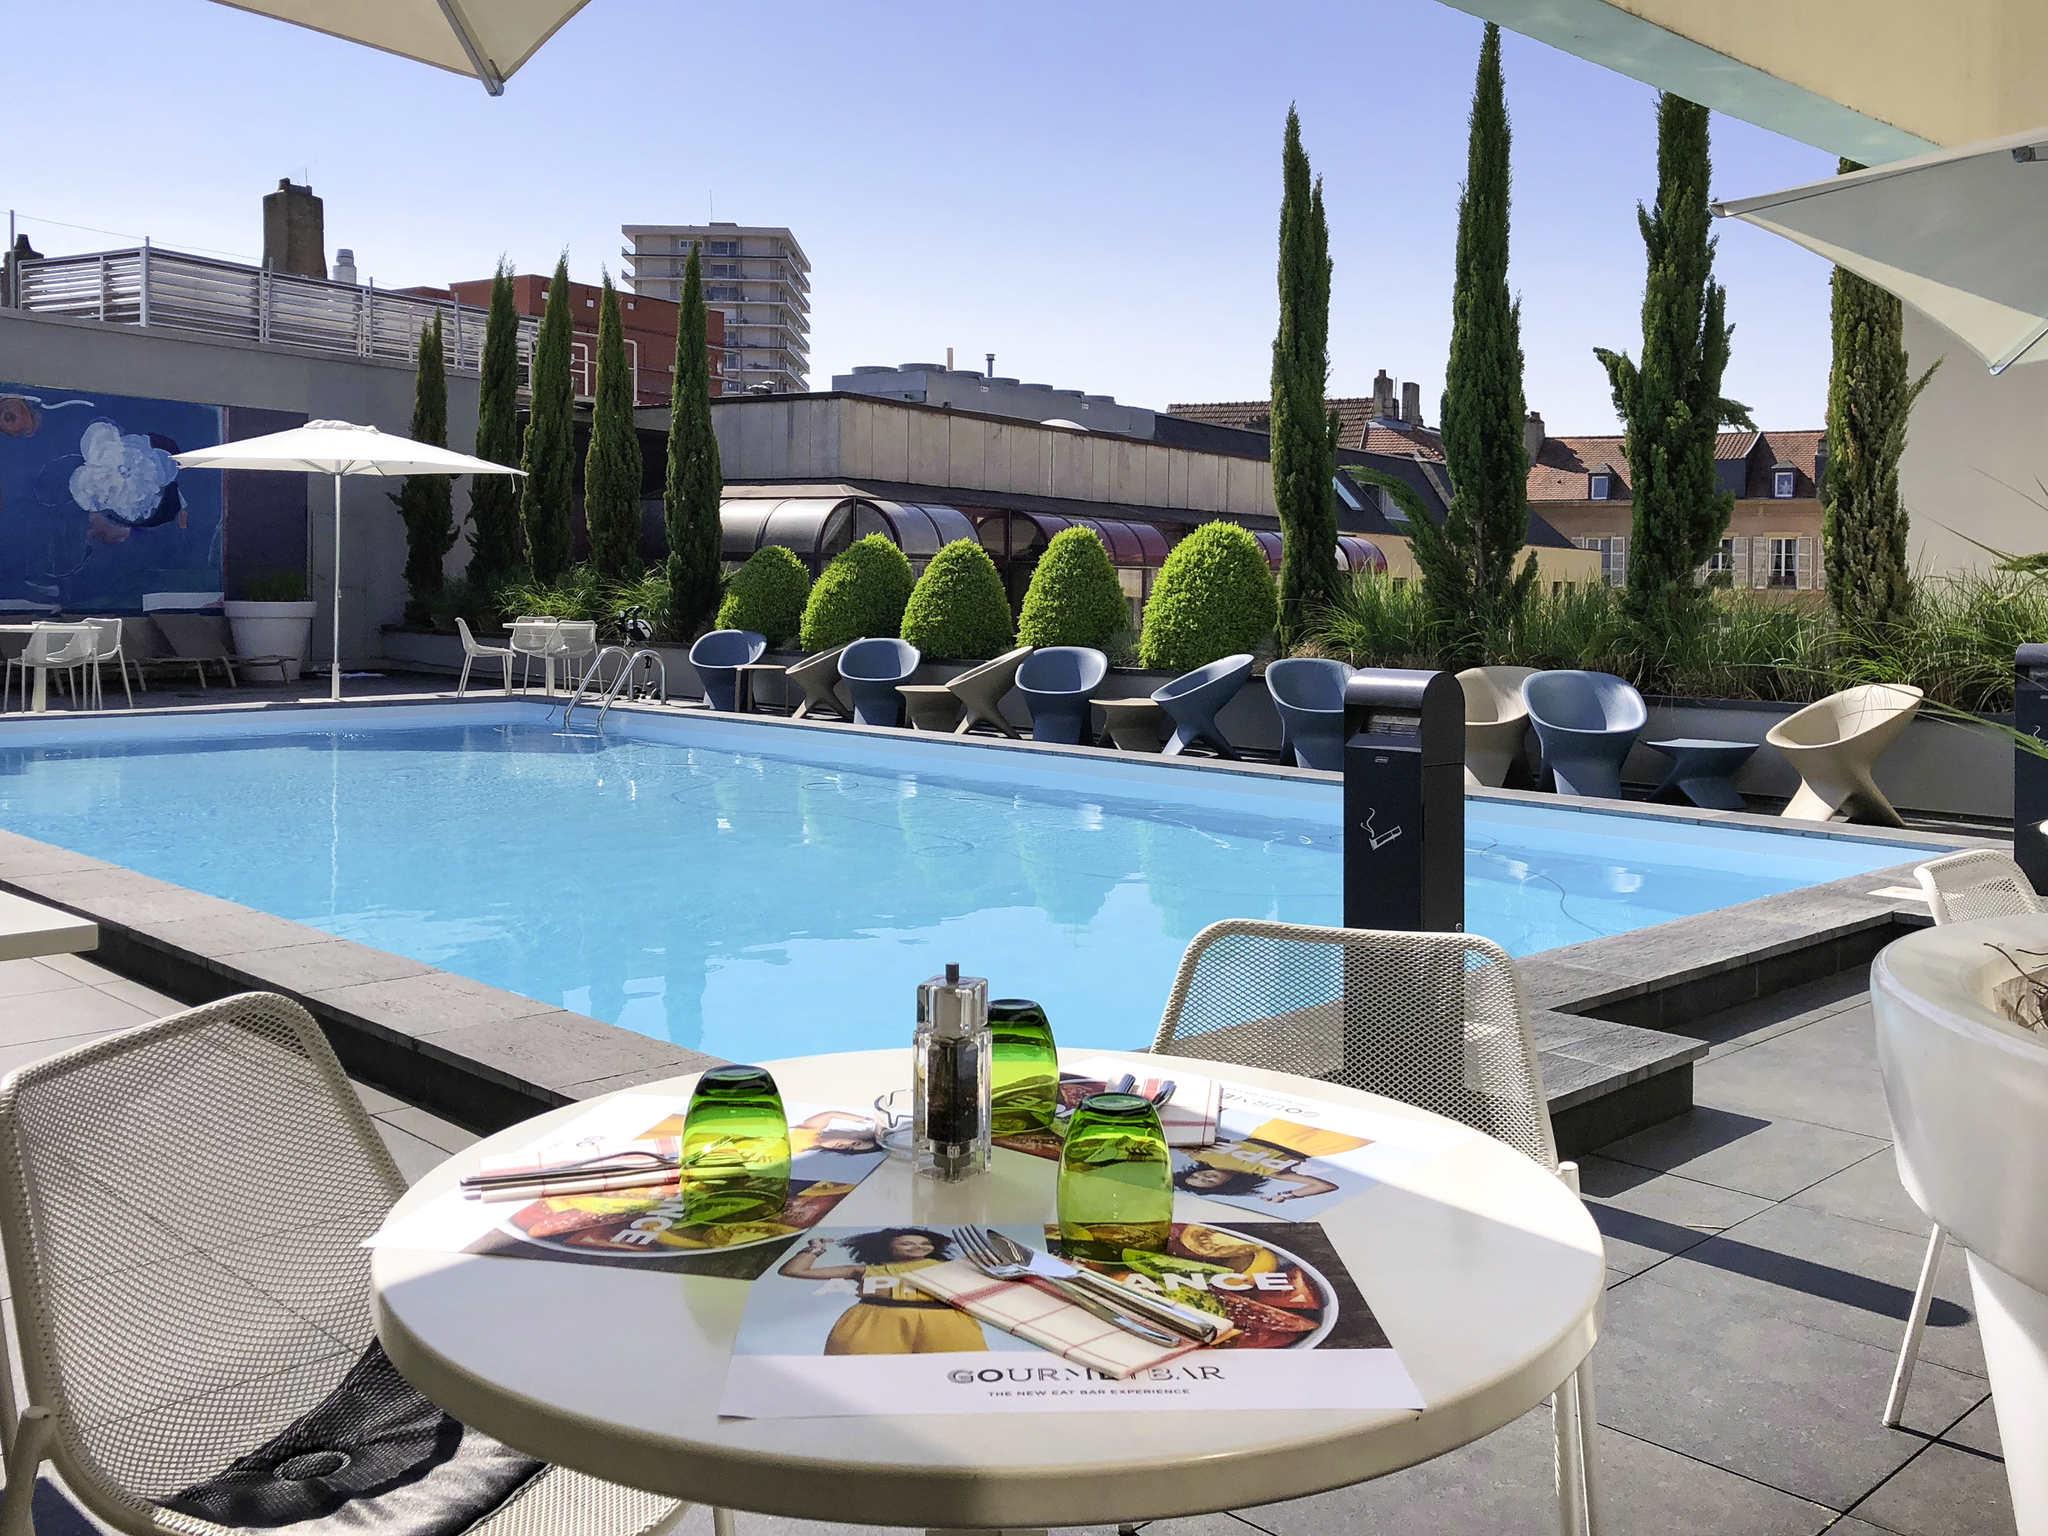 Hotel – Novotel Metz Centre